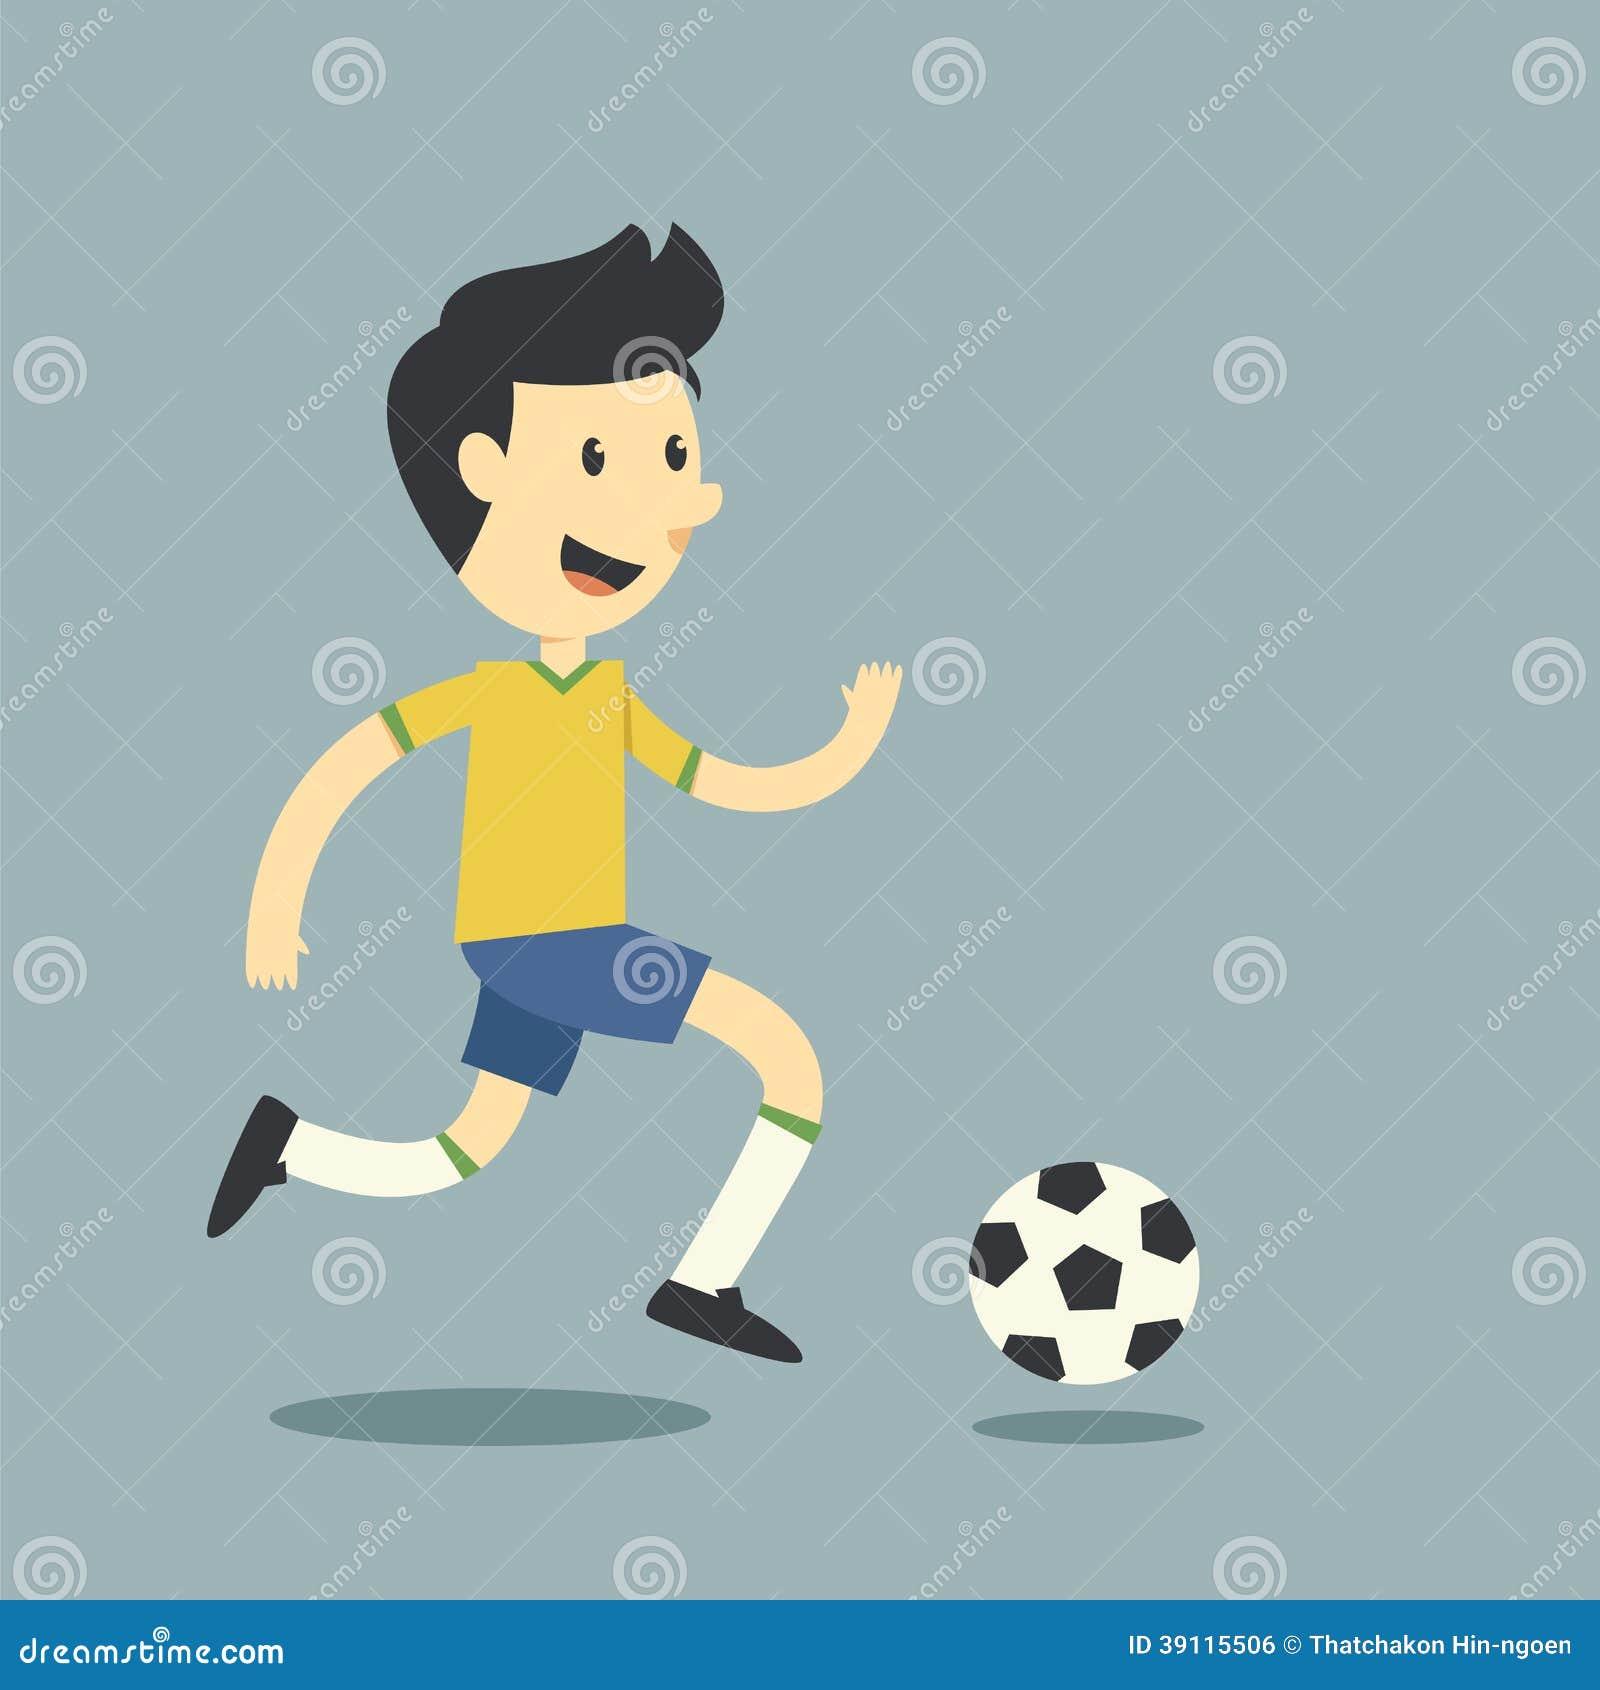 Pretvoetbalster